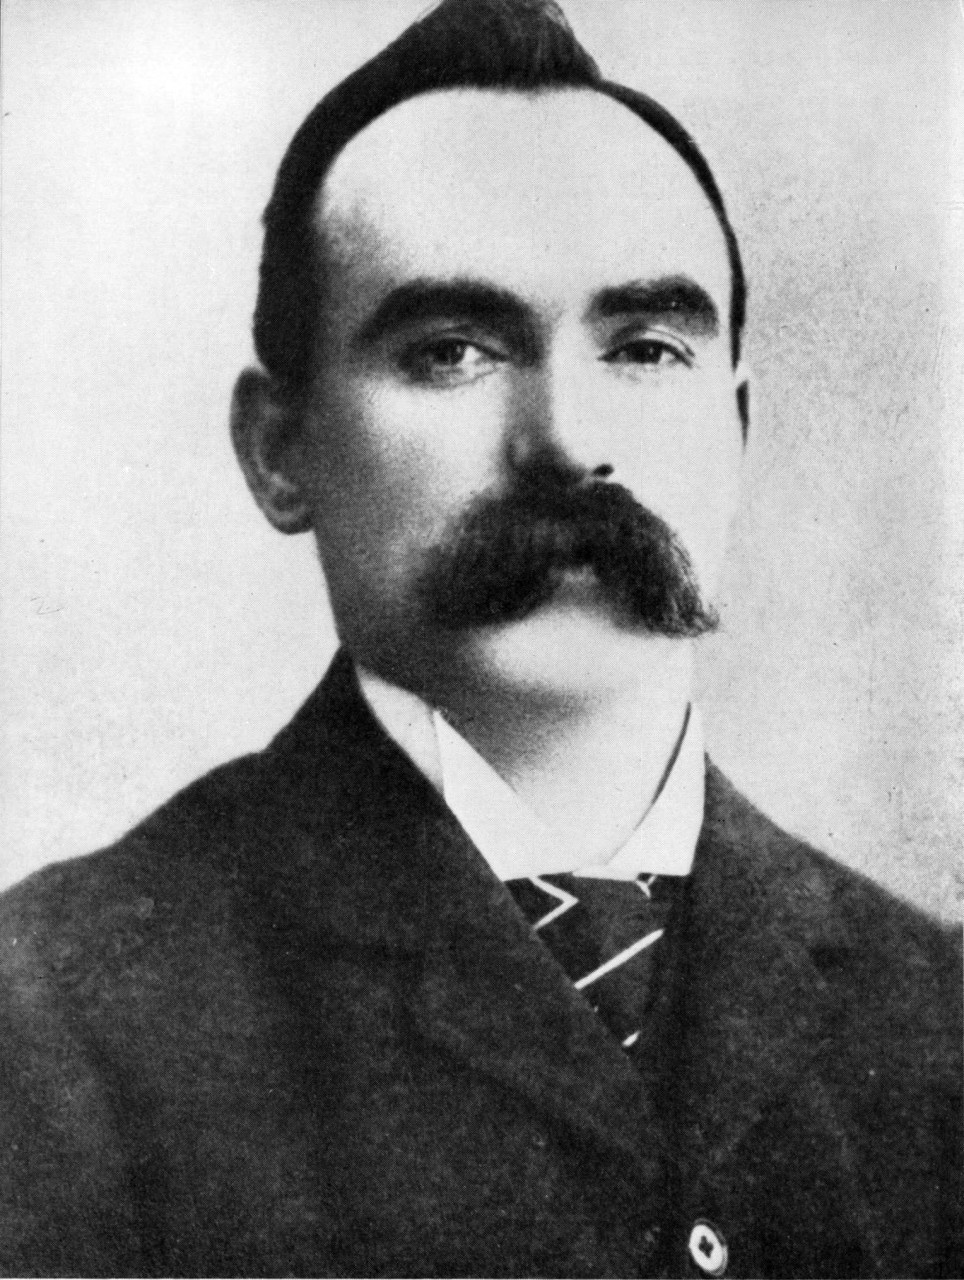 James Connolly 1900